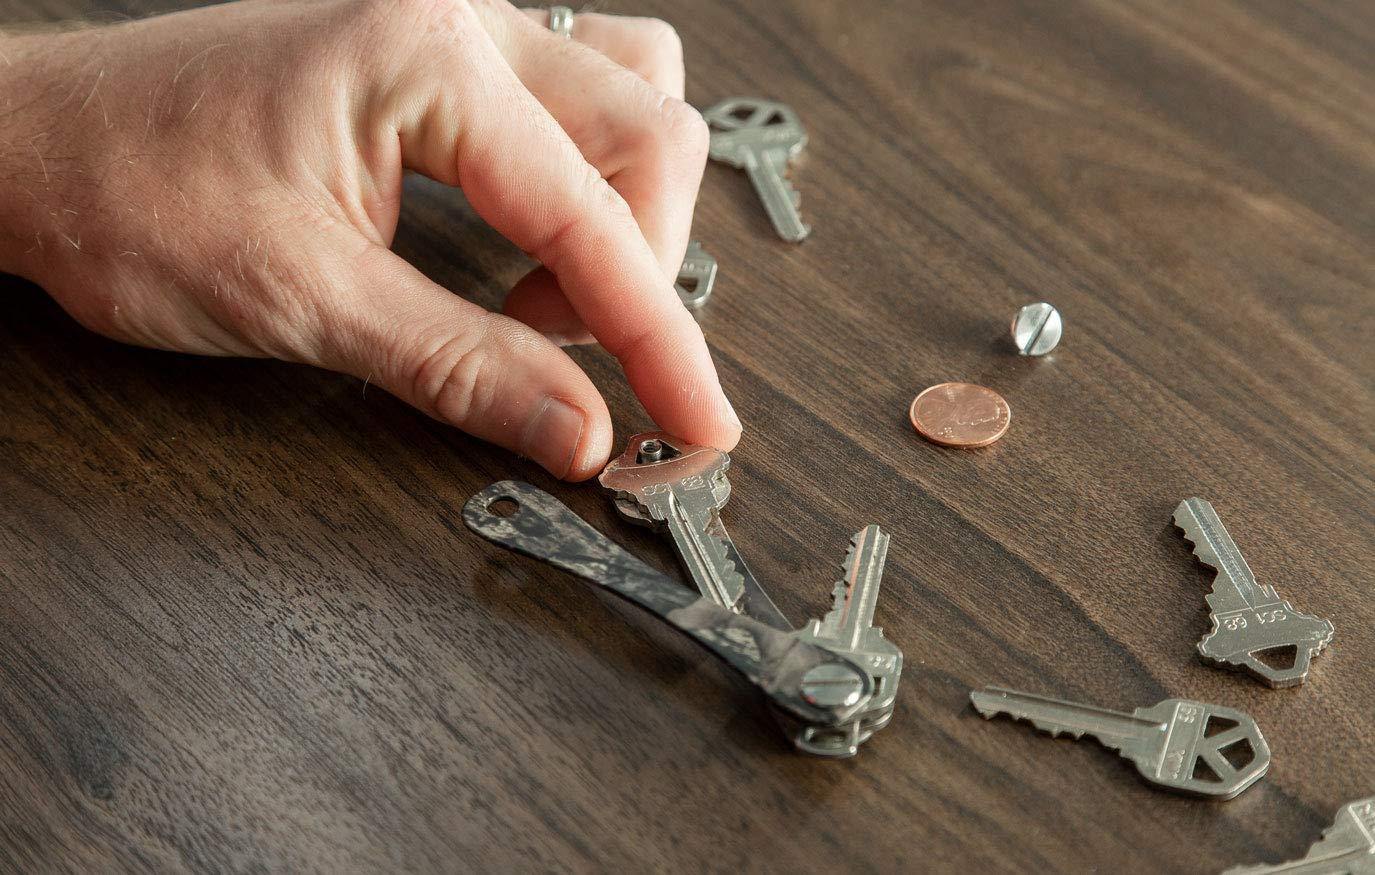 Compact Key Holder and Keychain Organizer up to 14 Keys KeySmart